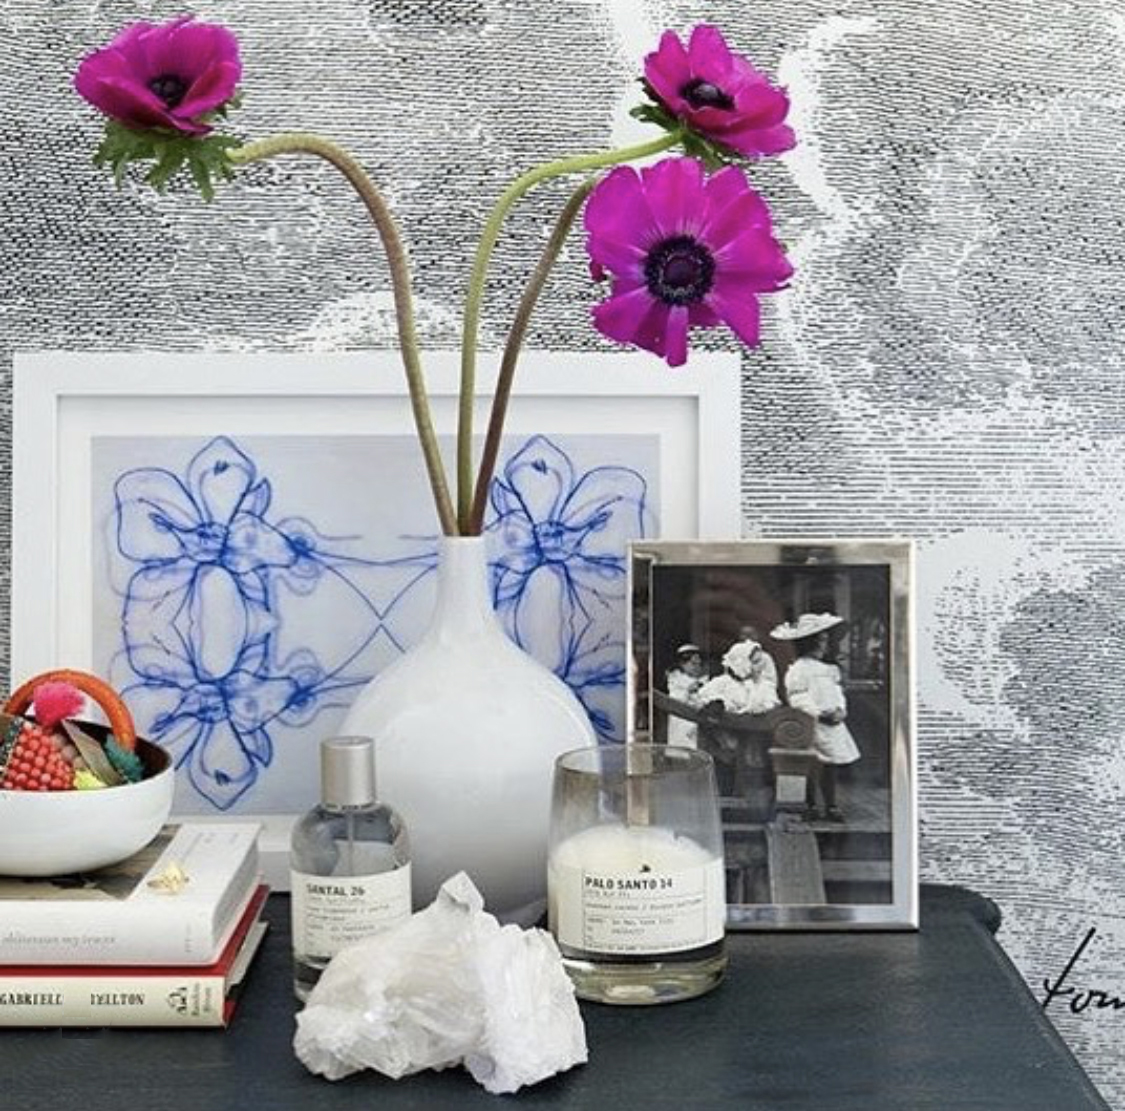 Kristi-Kohut-fine-art-in-homes-collector-reviews663.jpg